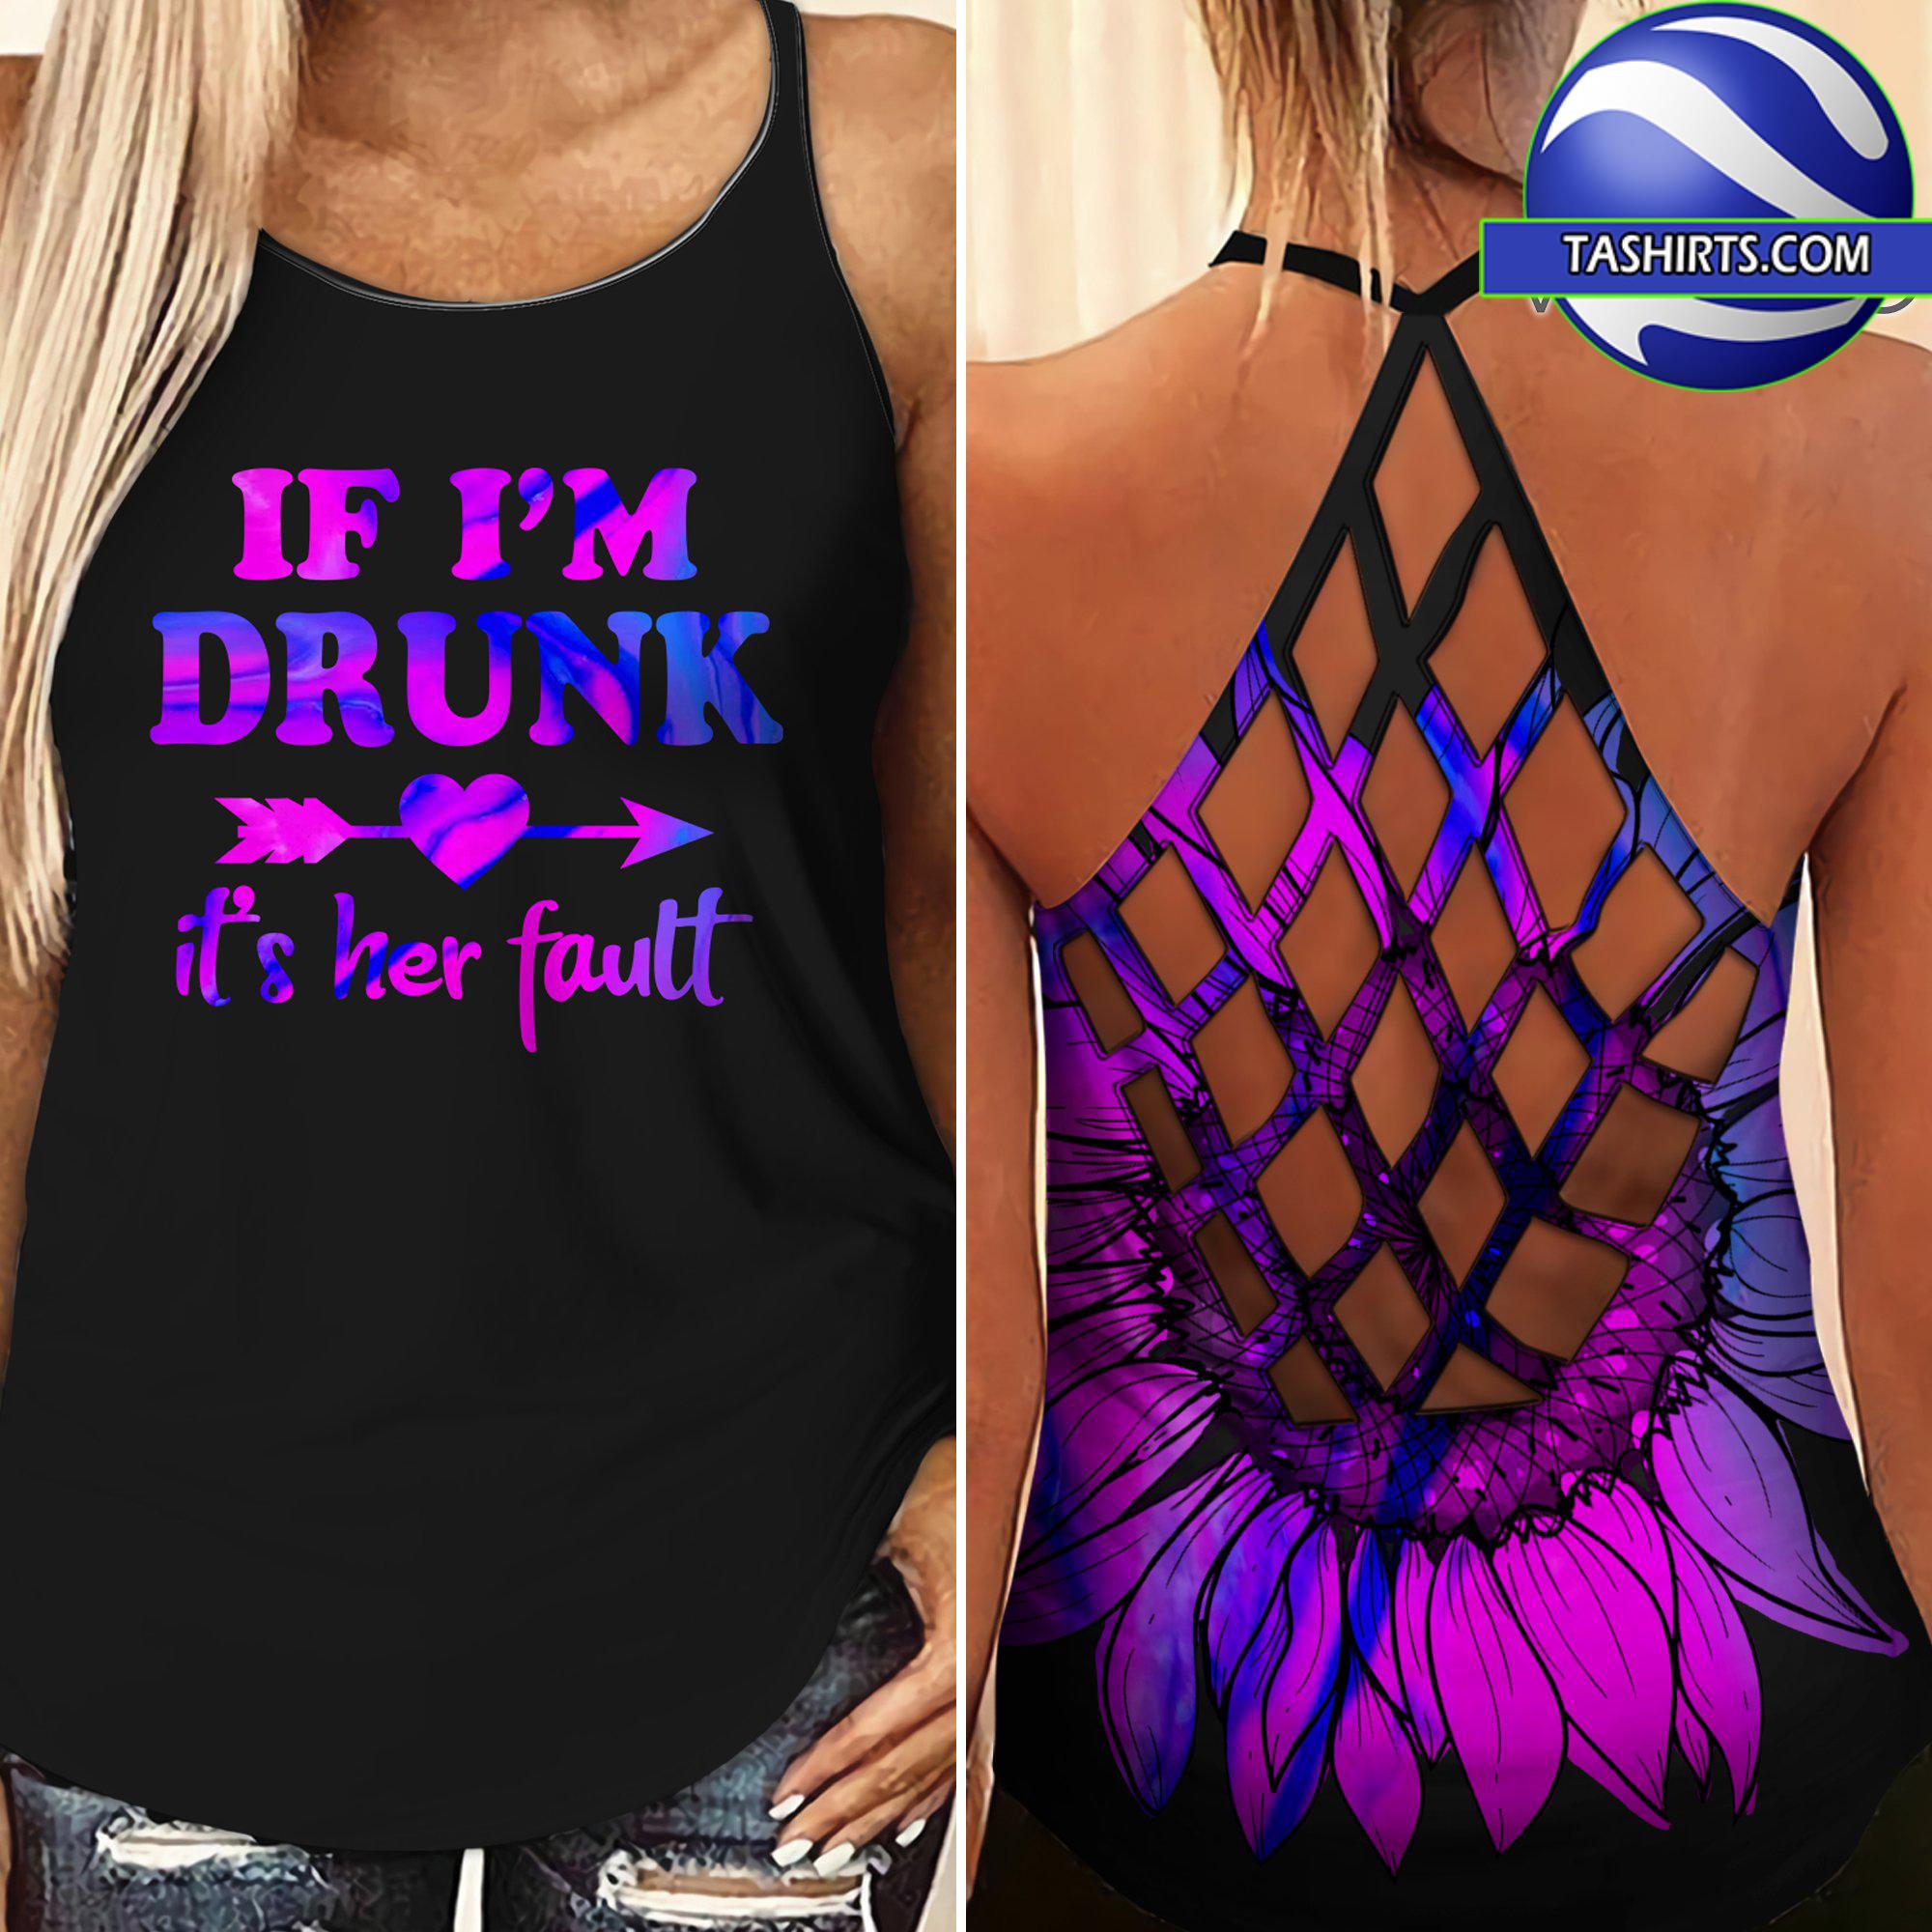 Bestie if i'm drunk it's her fault criss-cross open back camisole tank top